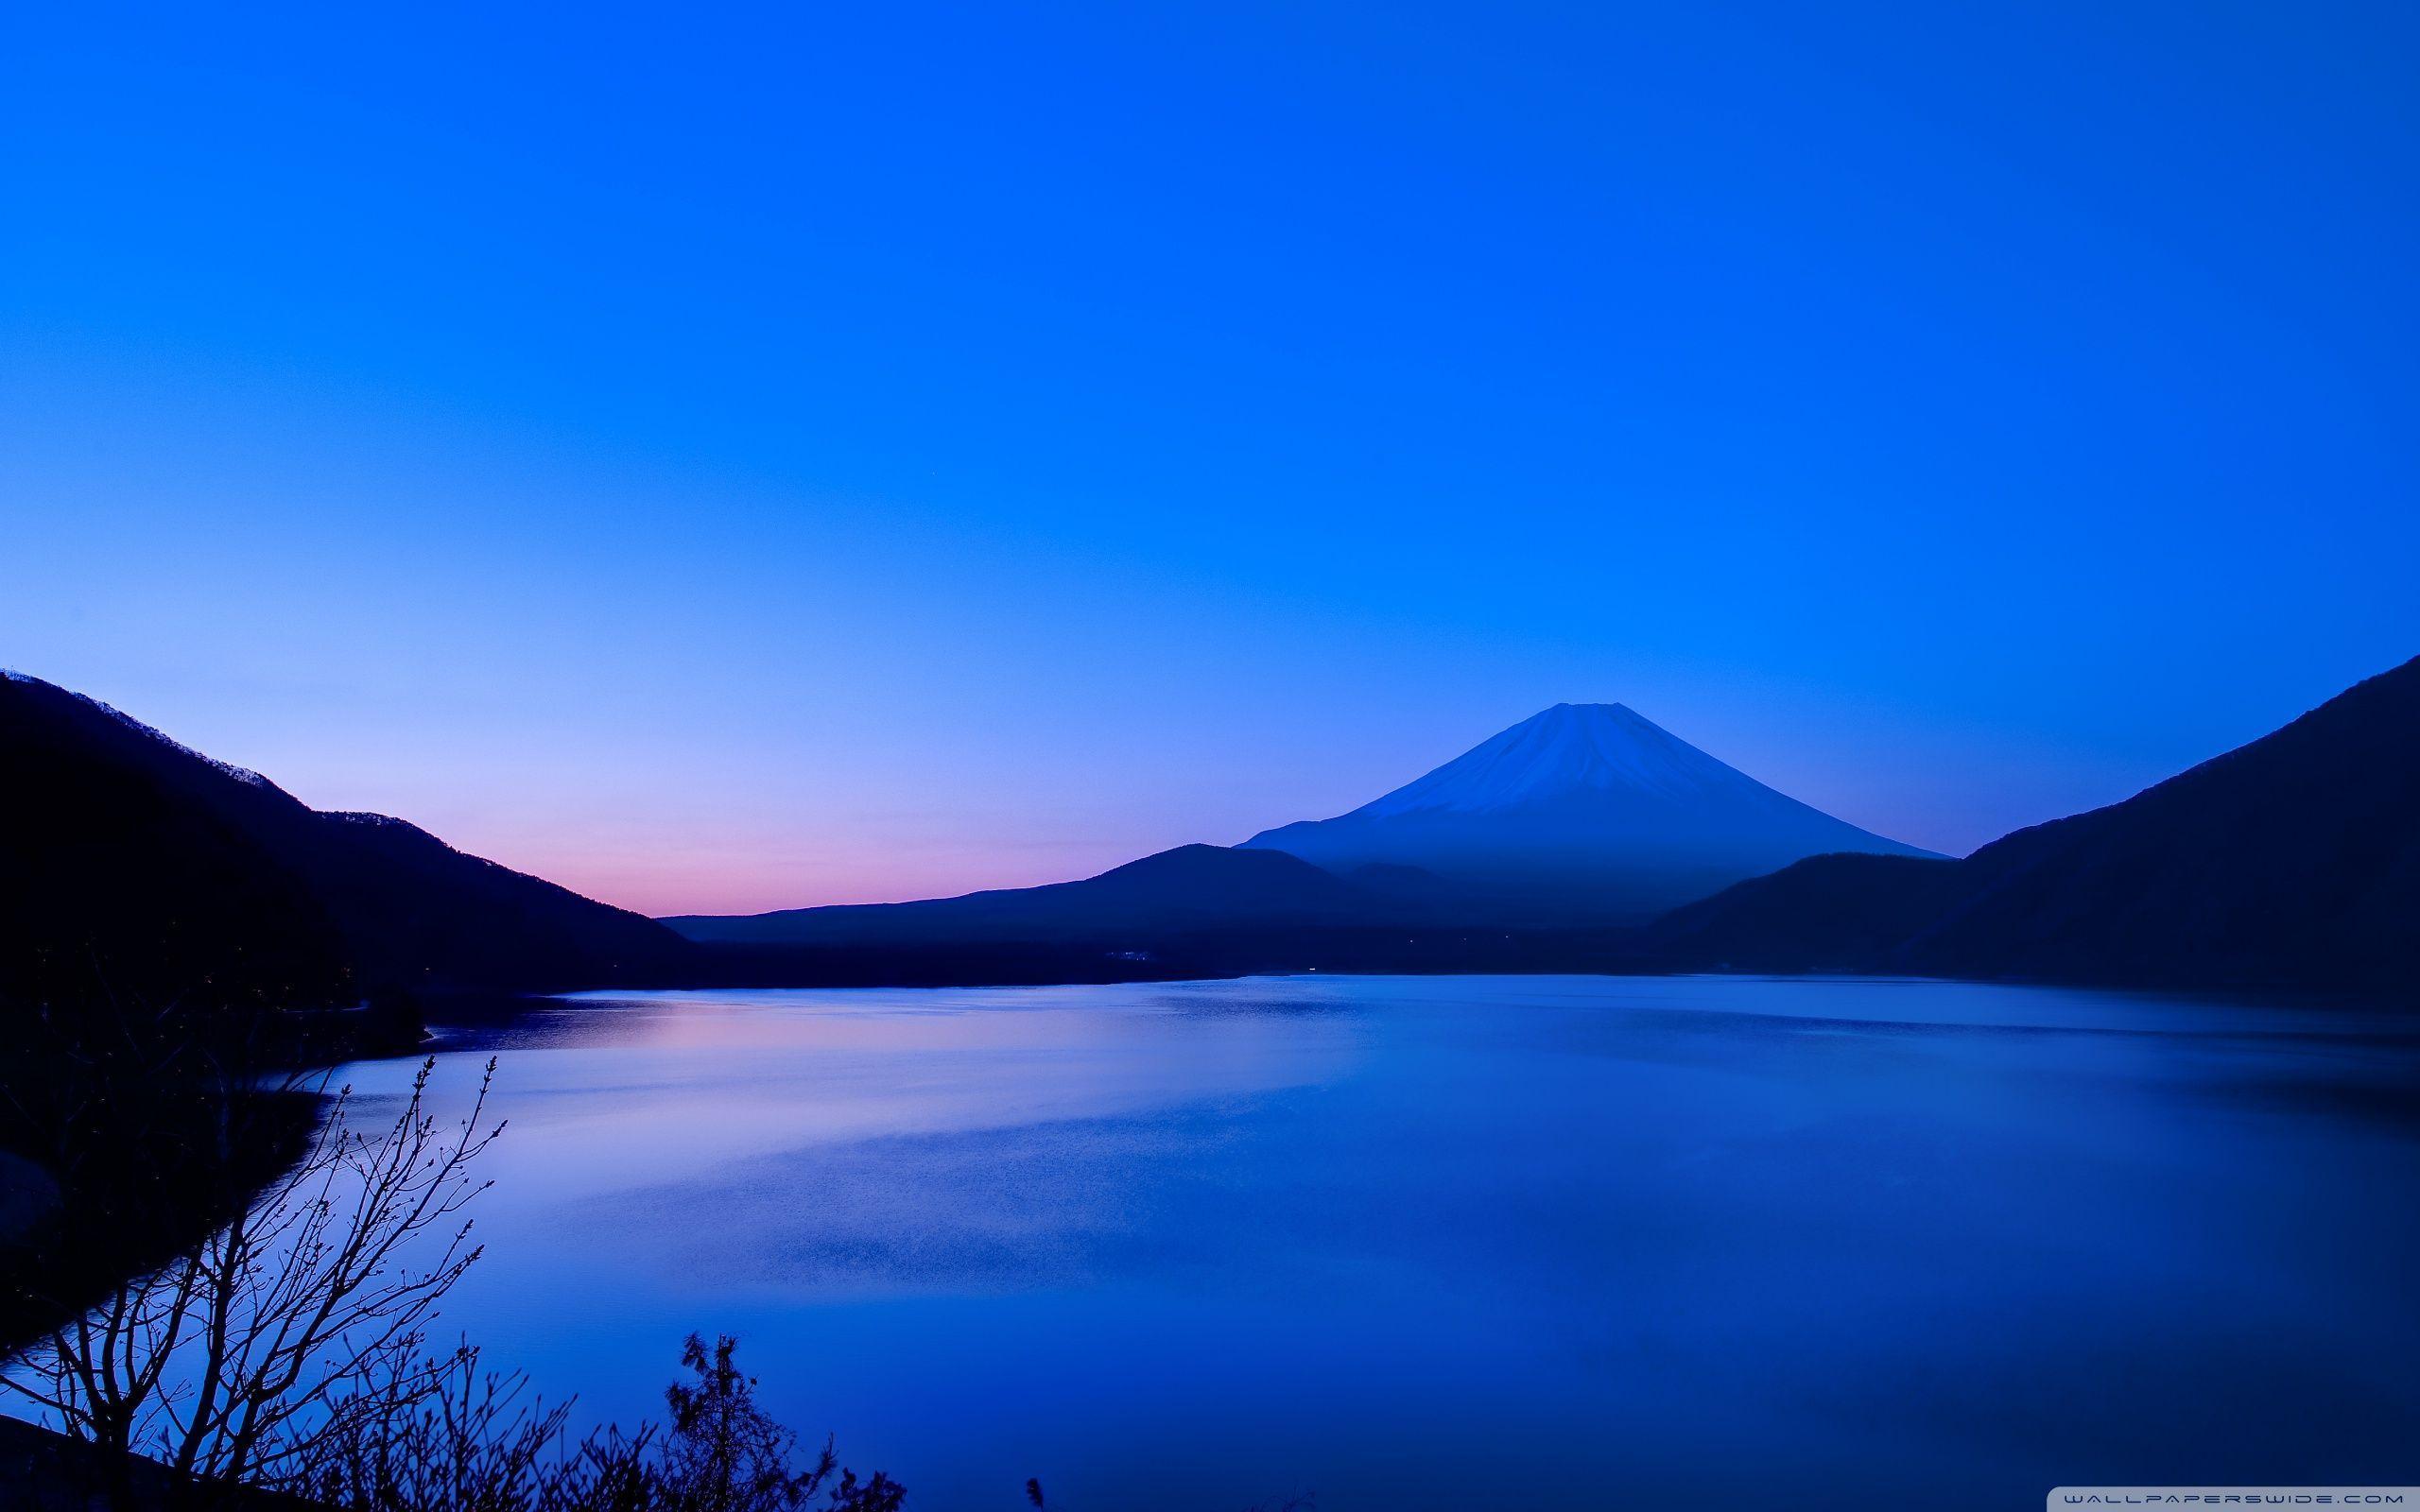 Japan Mountains Wallpapers - Top Free Japan Mountains ...